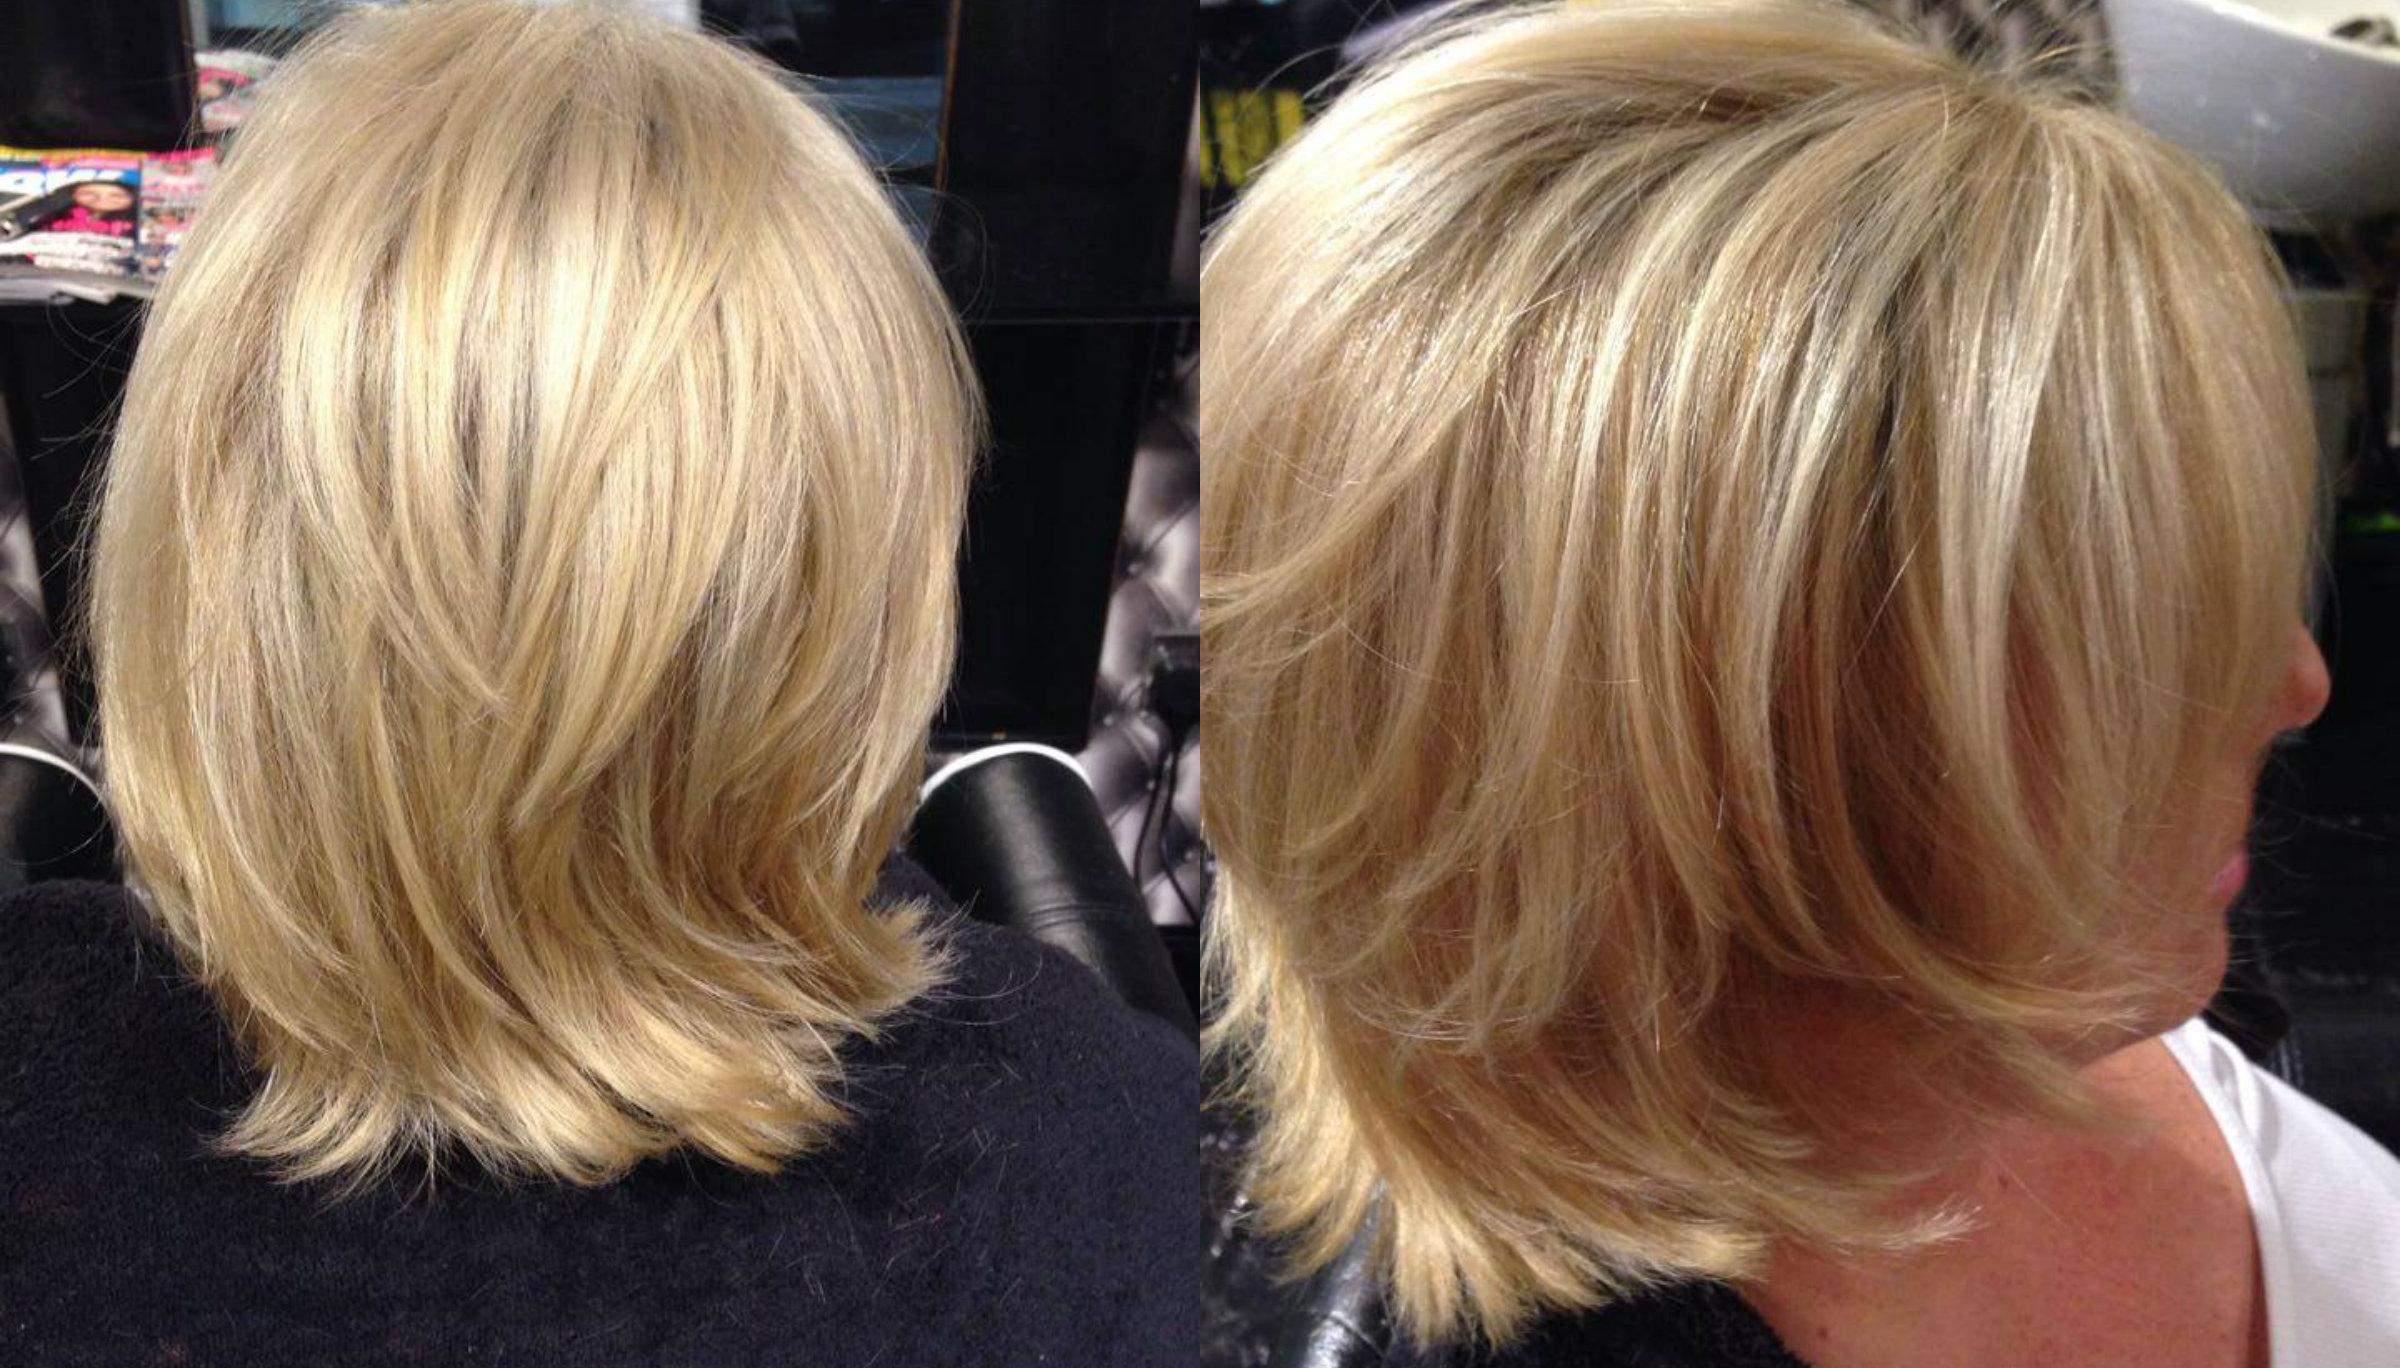 Come rimedi di gente per fermare una perdita di capelli